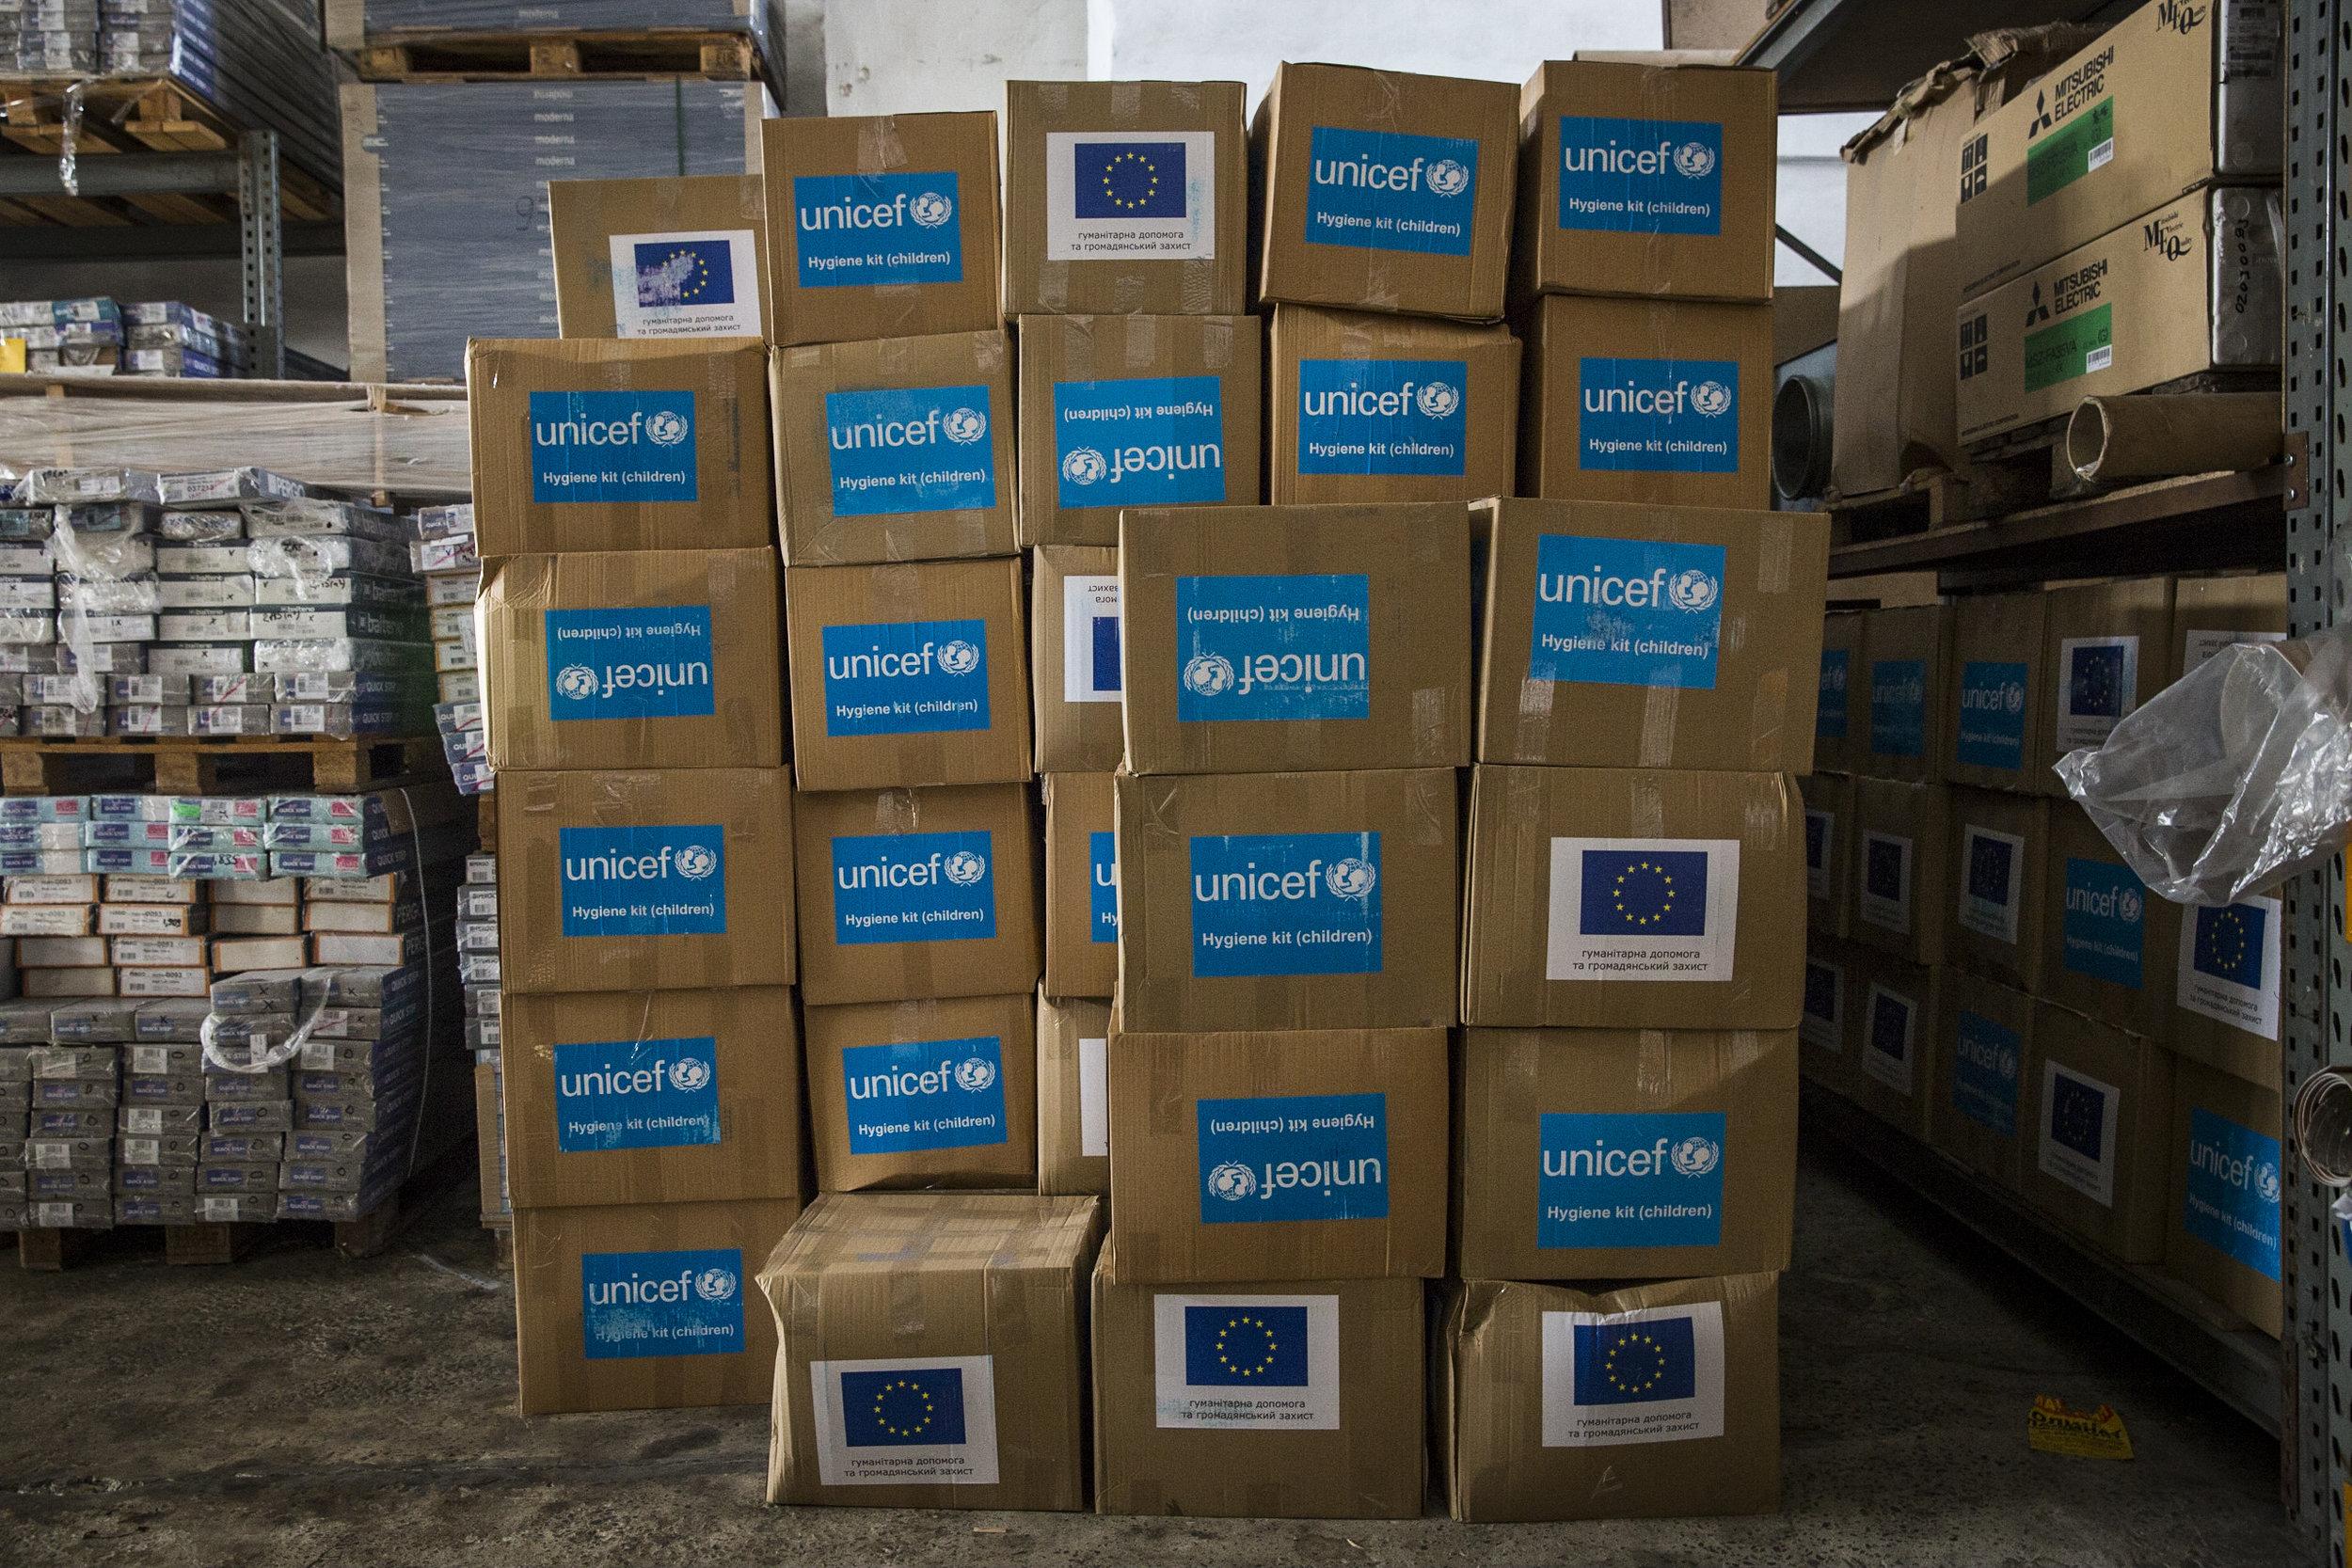 FRANCESCAVOLPI_UNICEF_EASTERN UKRAINE04.jpg